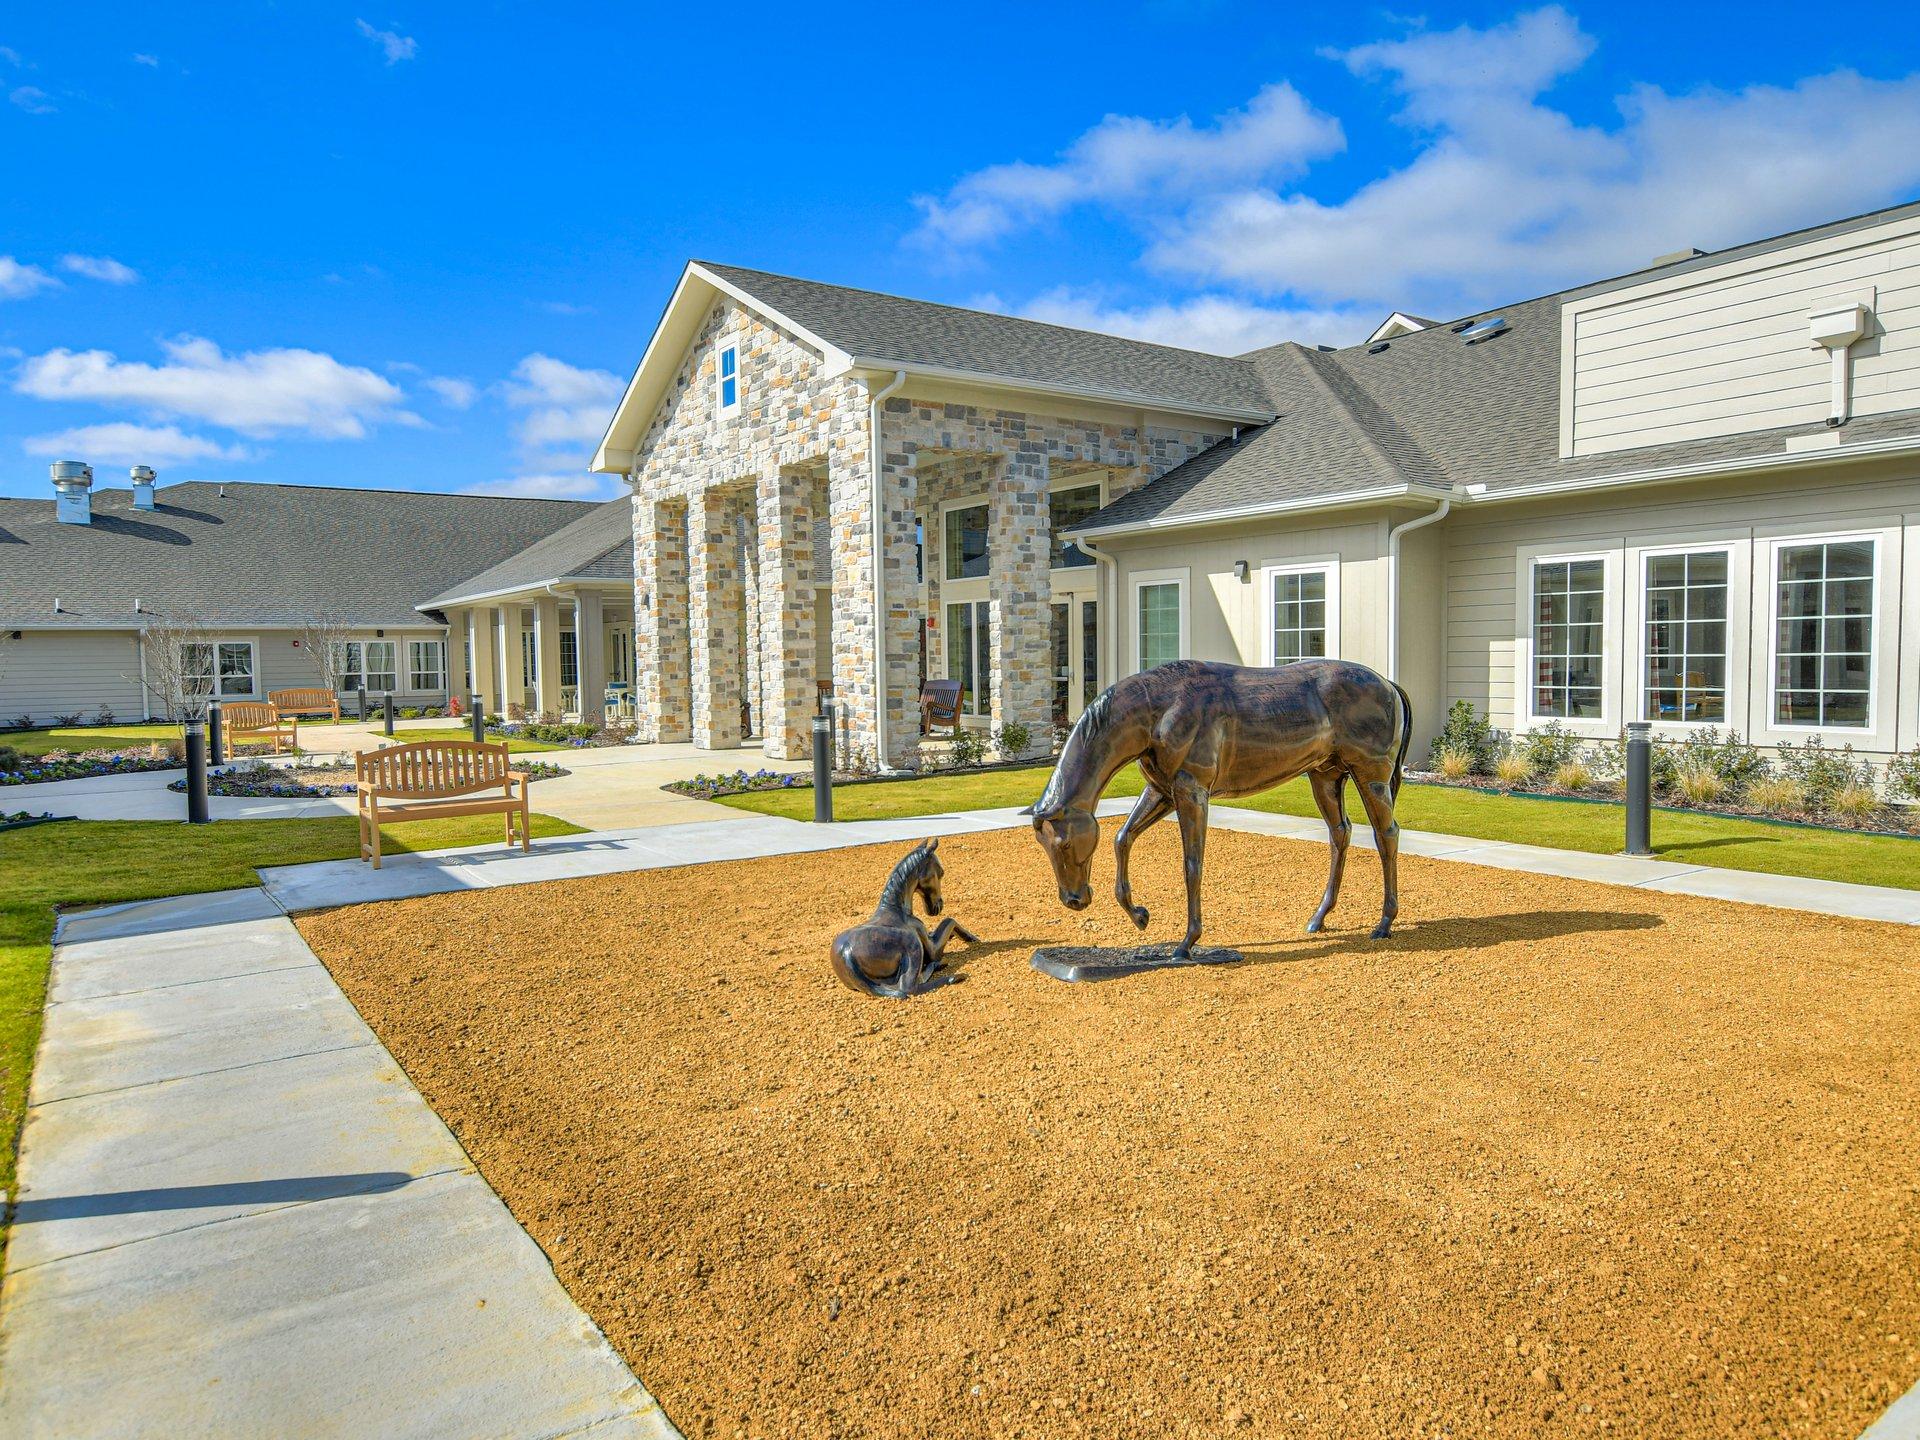 Civitas Senior Living and PremCap Senior Living Celebrates Grand Opening of New Community in Weatherford, Texas